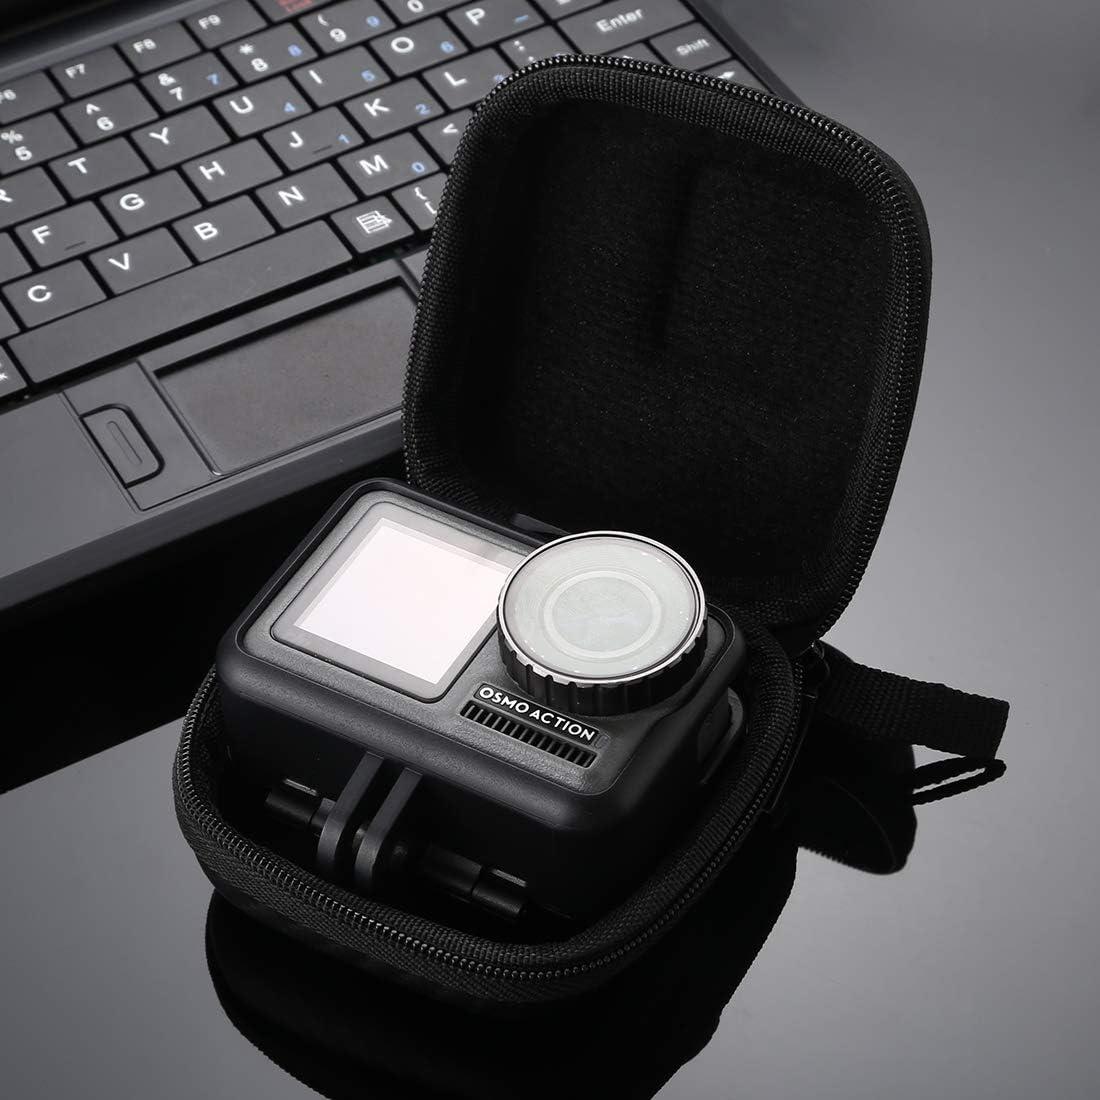 Mini Portable Carbon Fiber Storage Bag for DJI New Action Durable